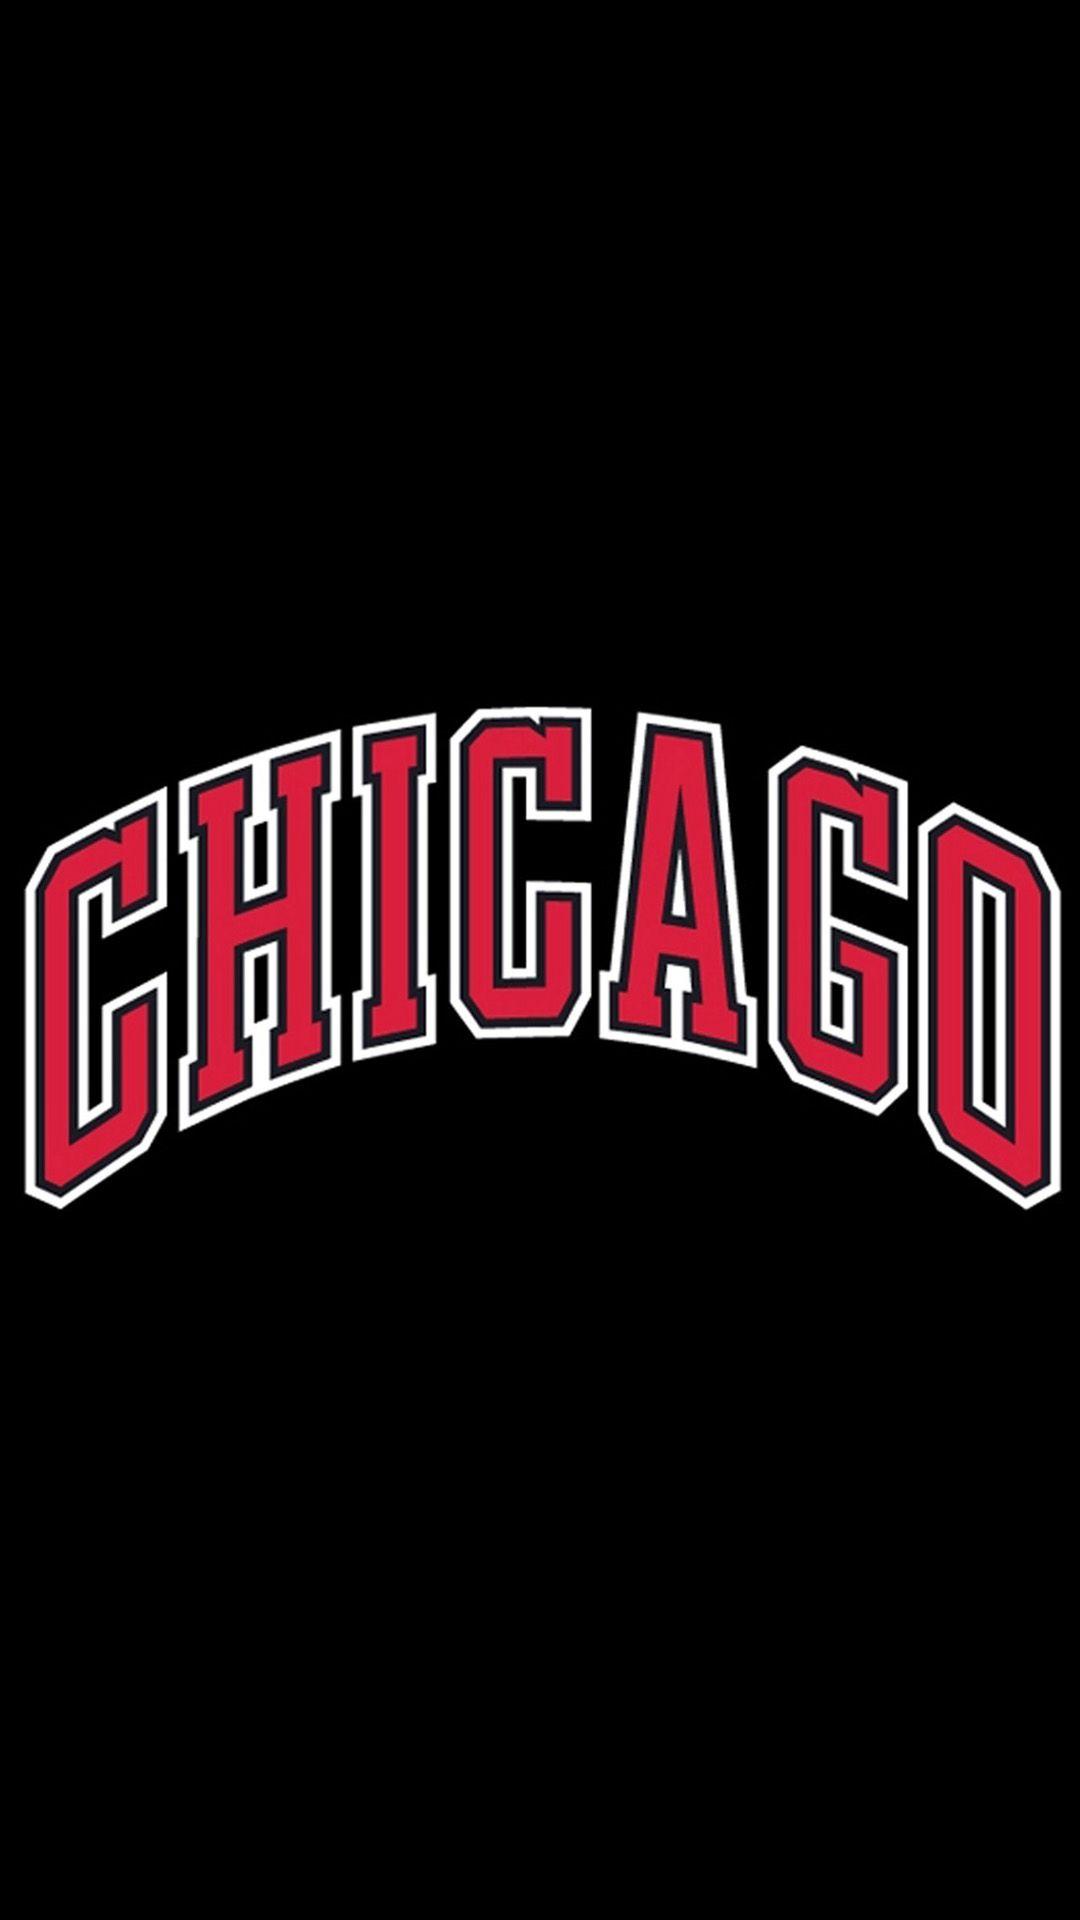 Chicago Bulls Iphone Wallpaper Jordan Logo Android Wallpaper Hd